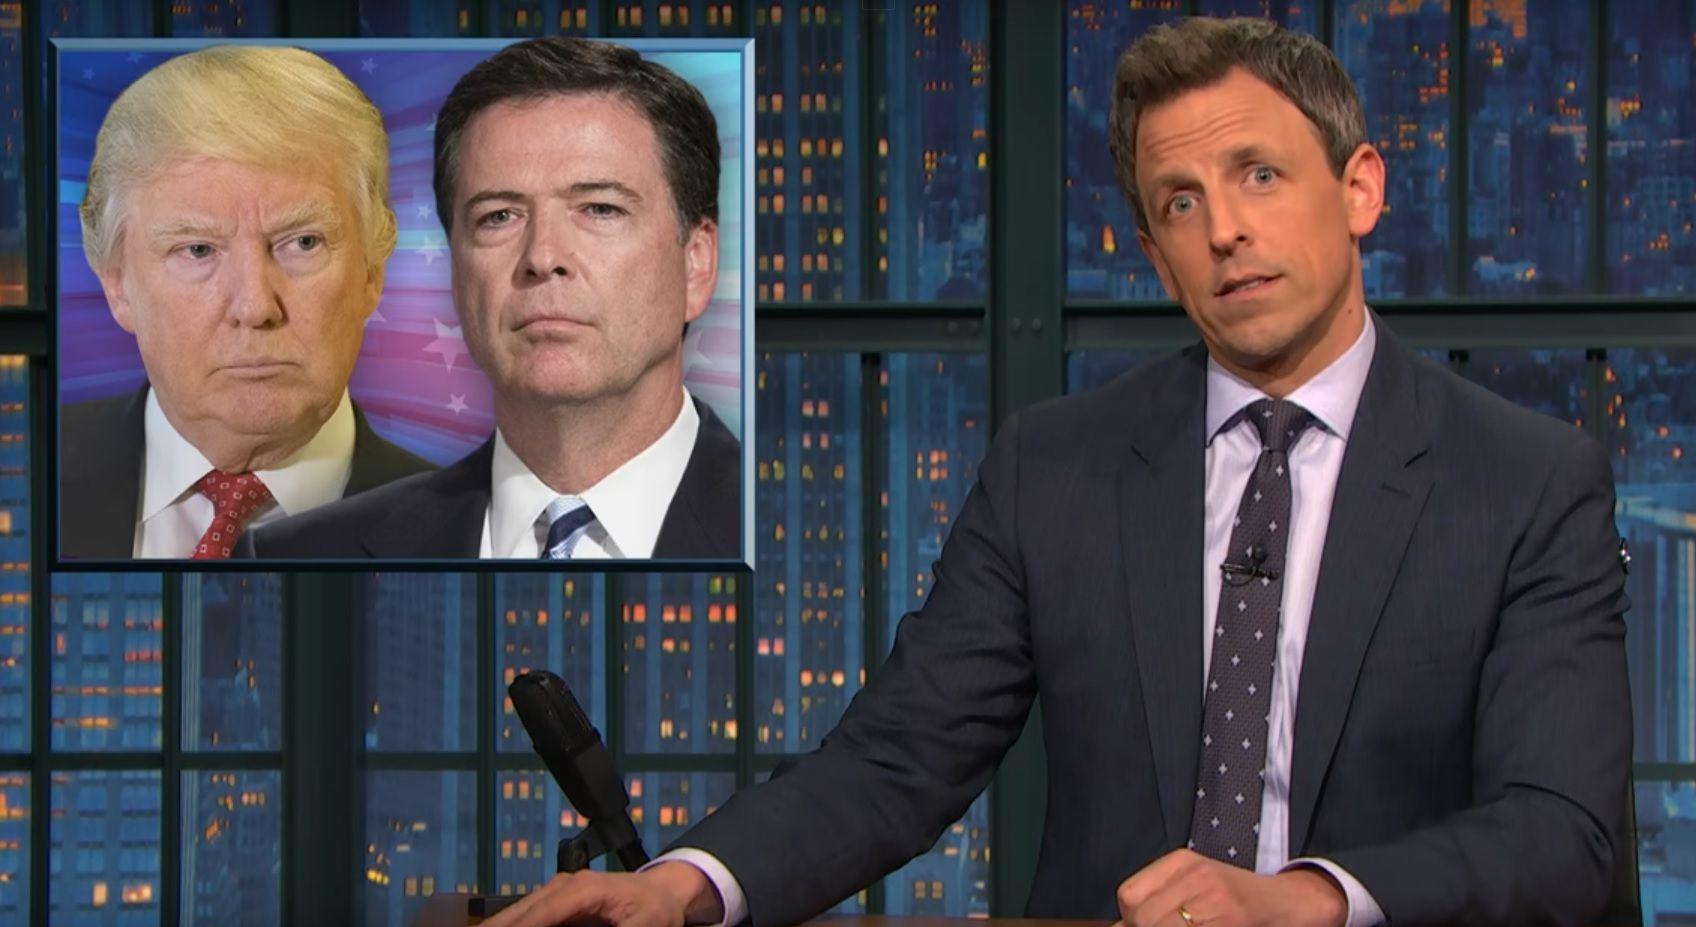 Watch: Seth Meyers Jokes About Trump Firing Comey Saga